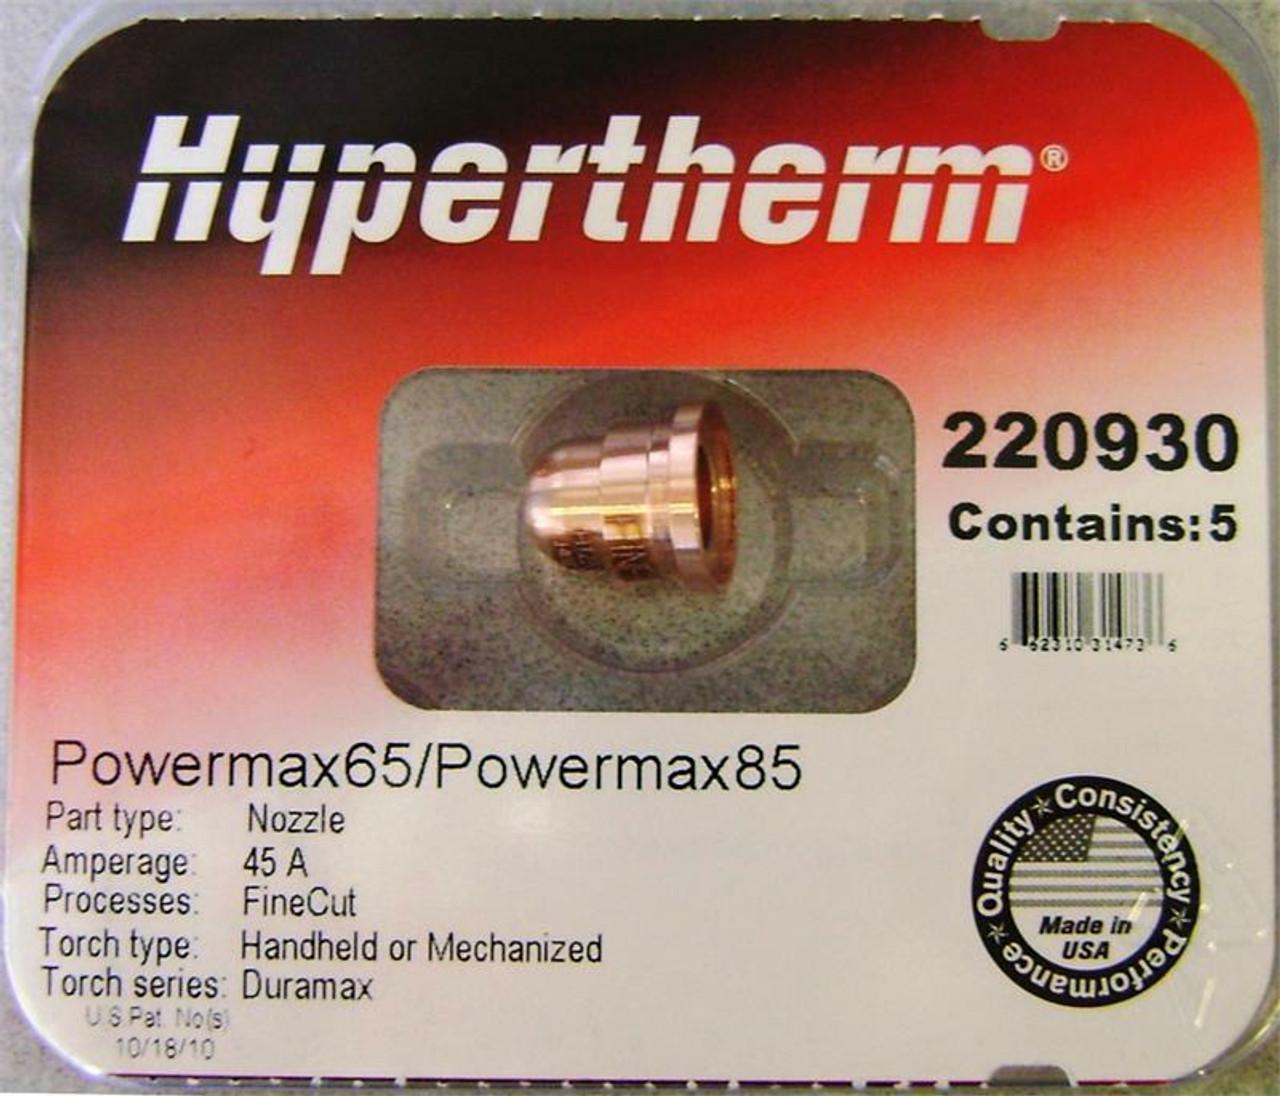 Hypertherm 220930 Powermax 85 Fine Cut Nozzles - 5 Pack